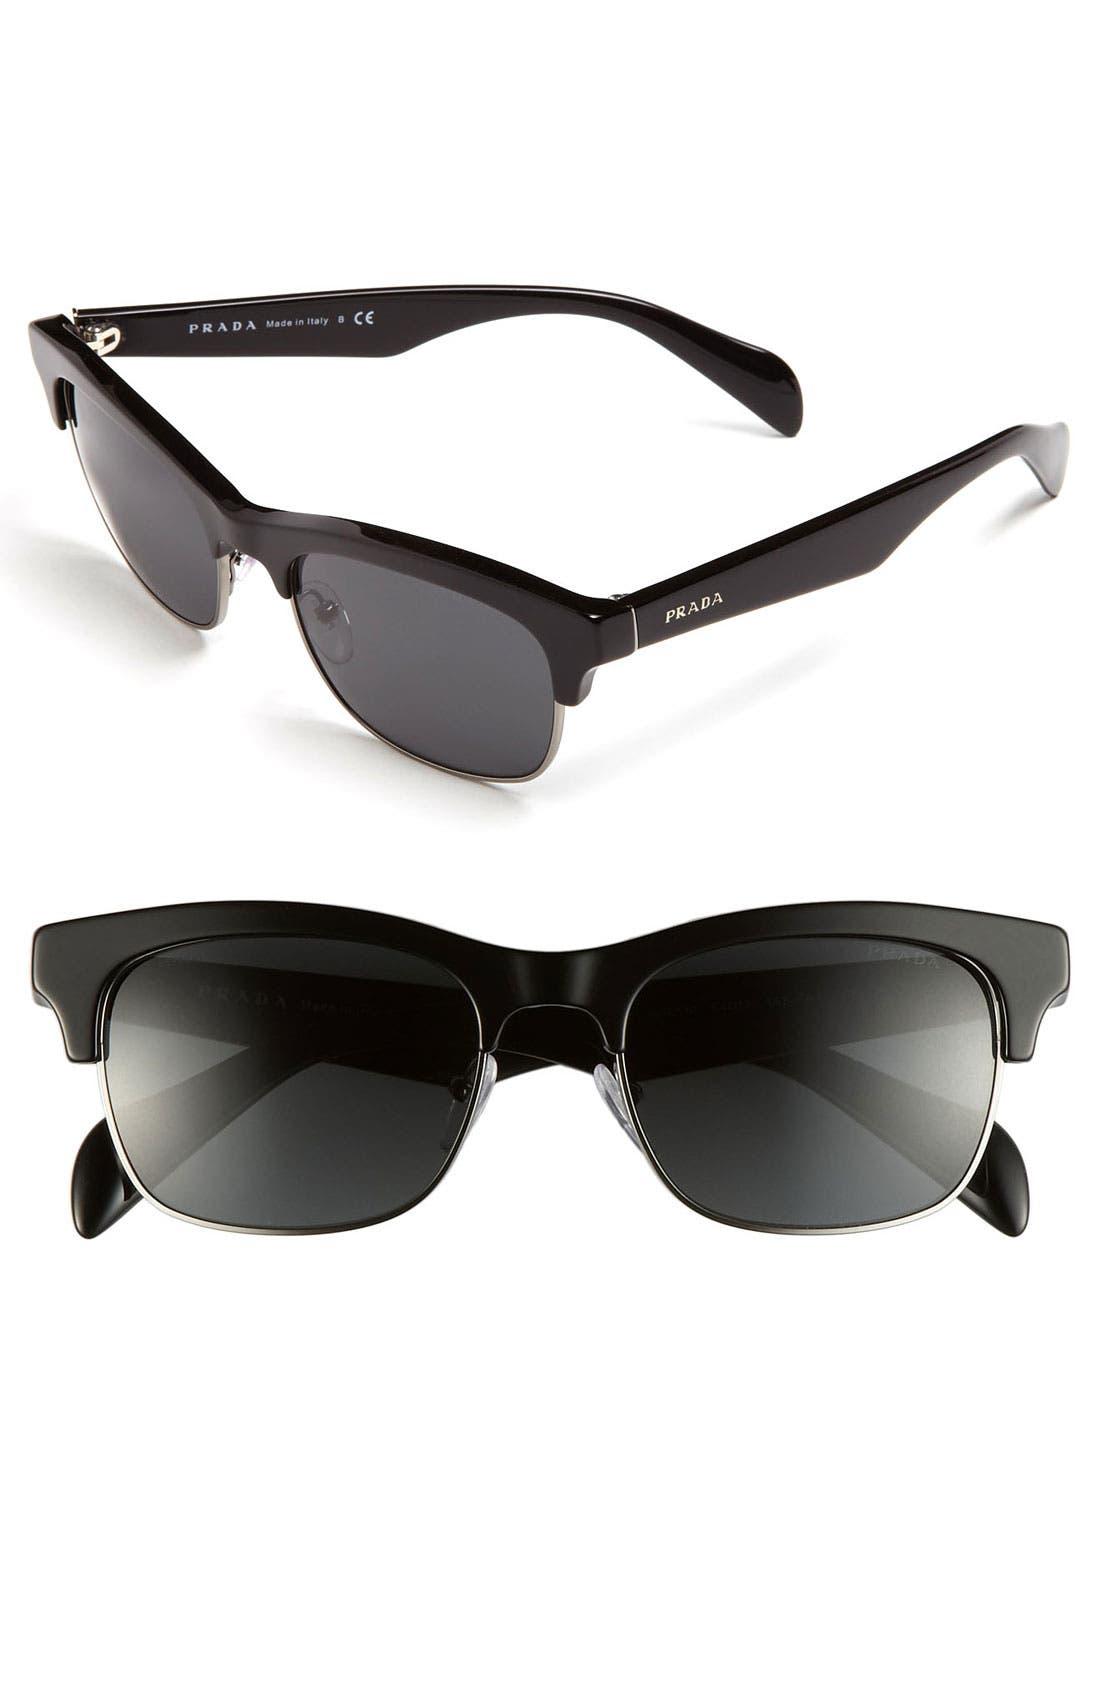 Main Image - Prada 54mm Sunglasses